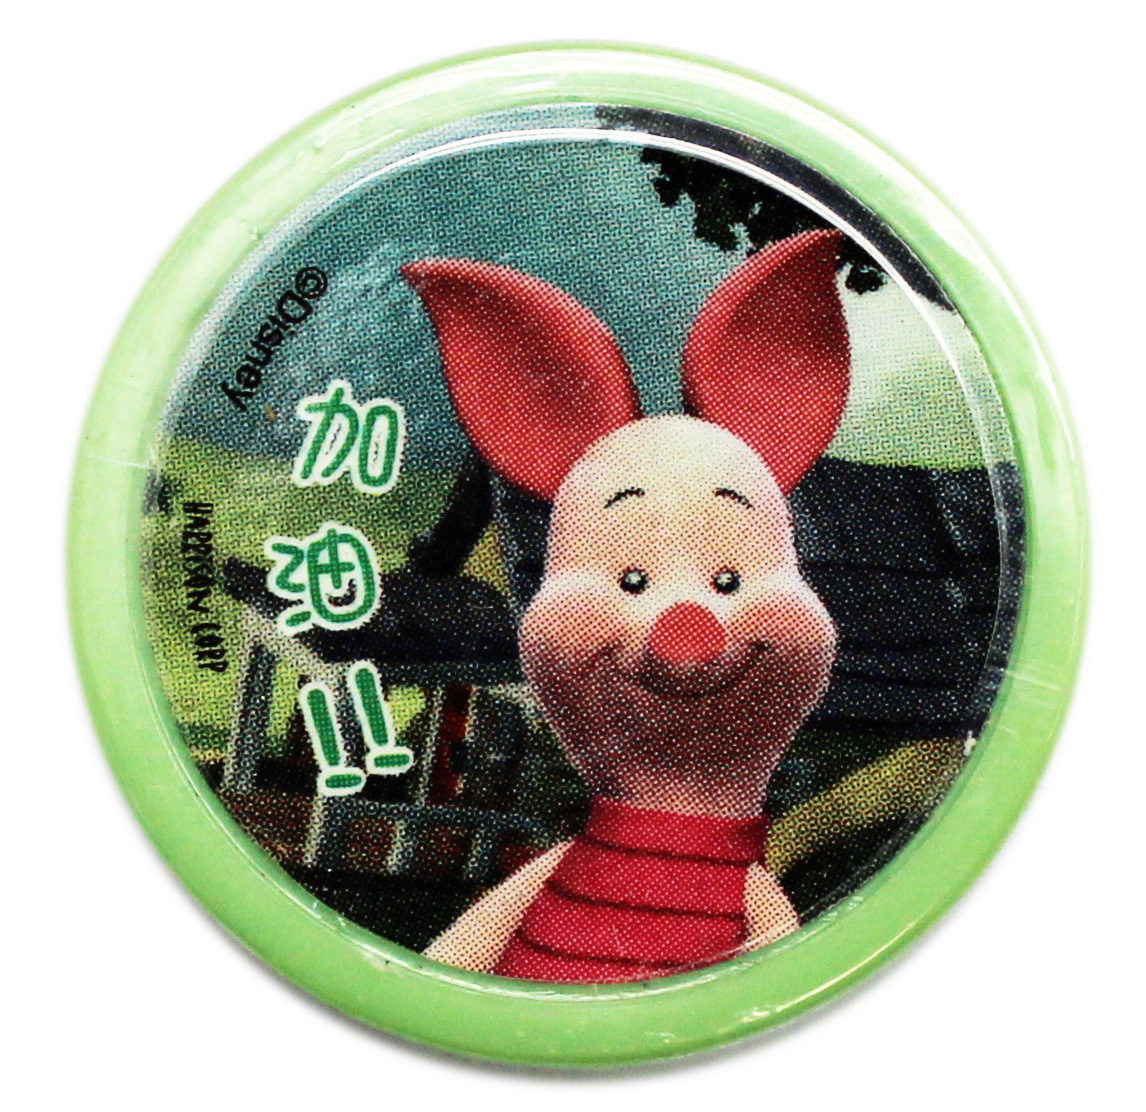 Disney's My Friends Tigger & Pooh Green Case Piglet Stamp